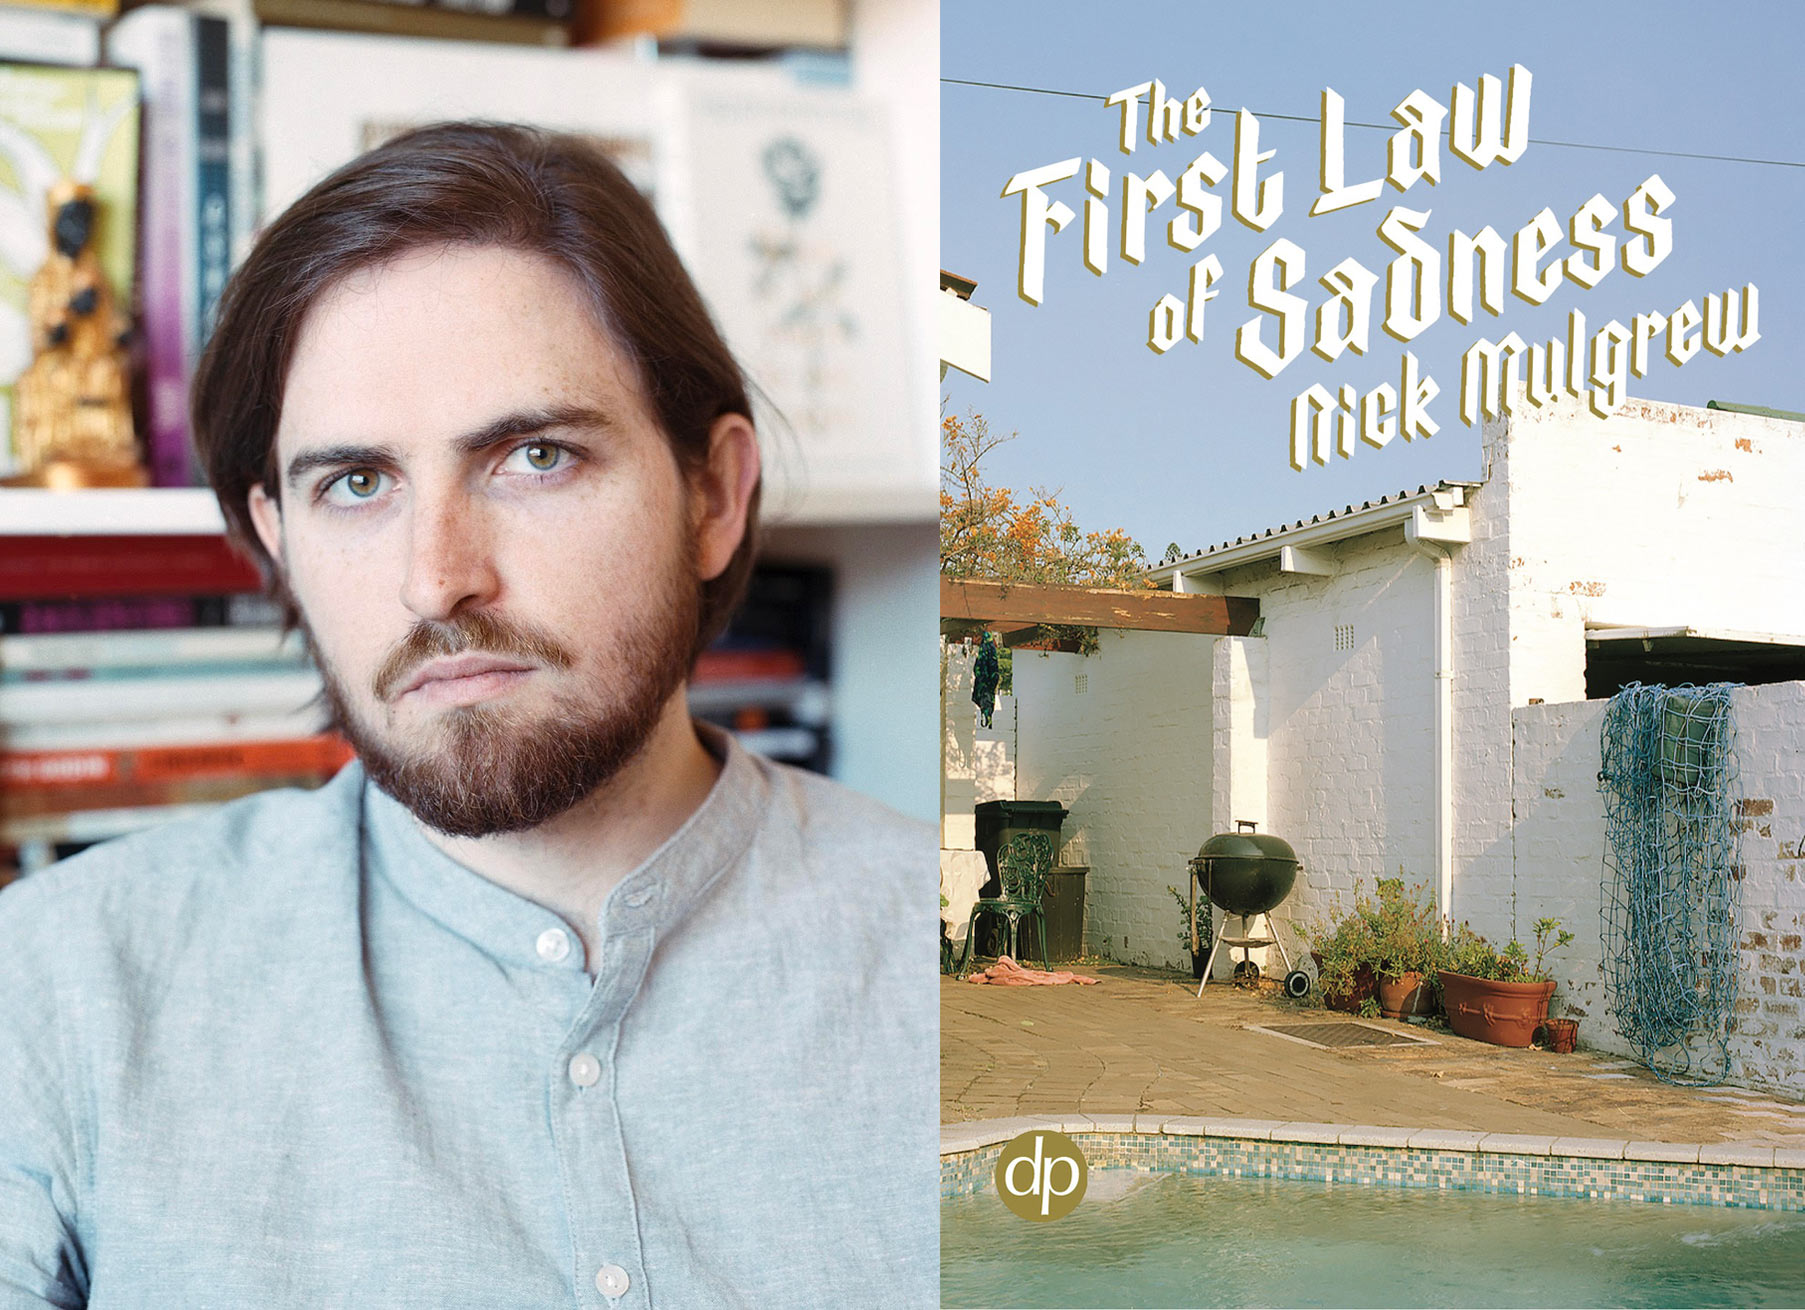 Nick-Mulgrew-The-First-Law-of-Sadness.jpg